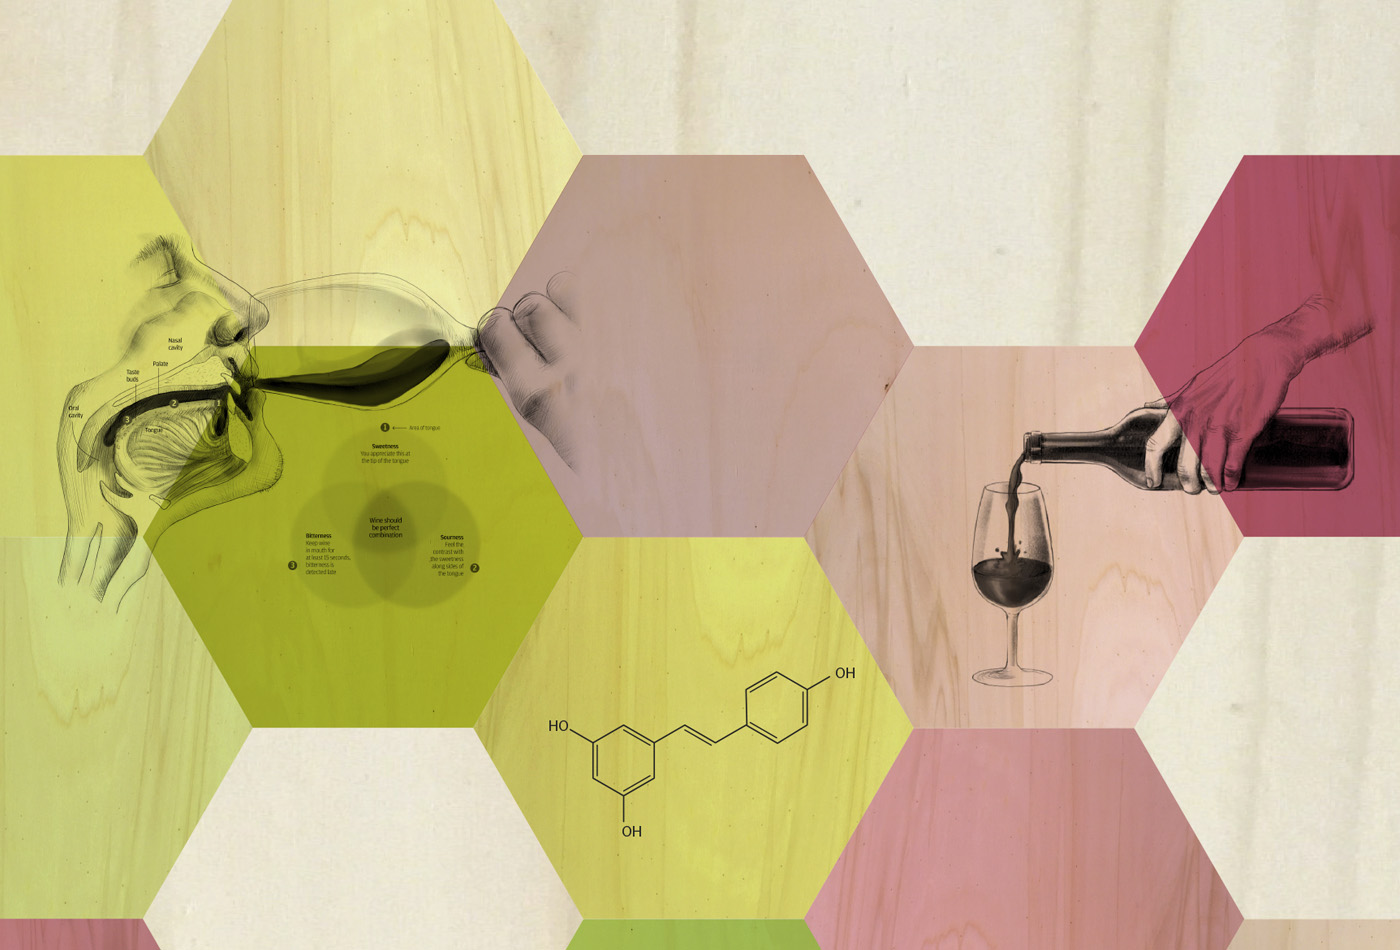 disseny-espai-the-alimentaria-experience-2016-vinorum-think